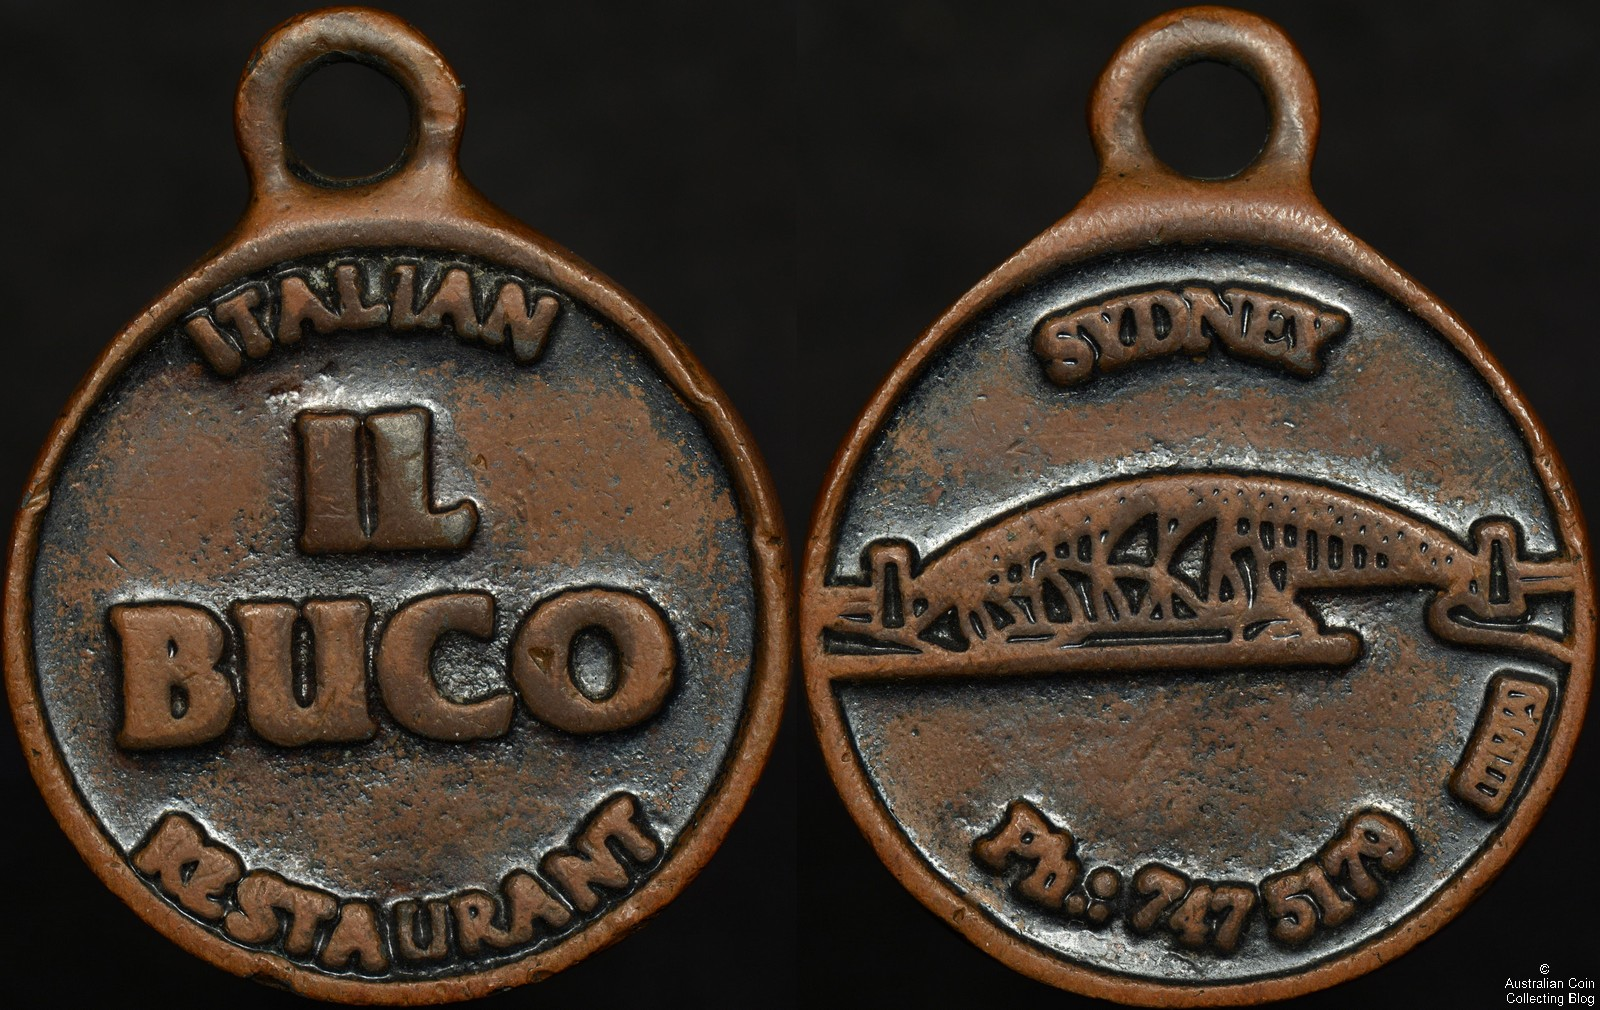 il Buco Restaurant Sydney Medallion